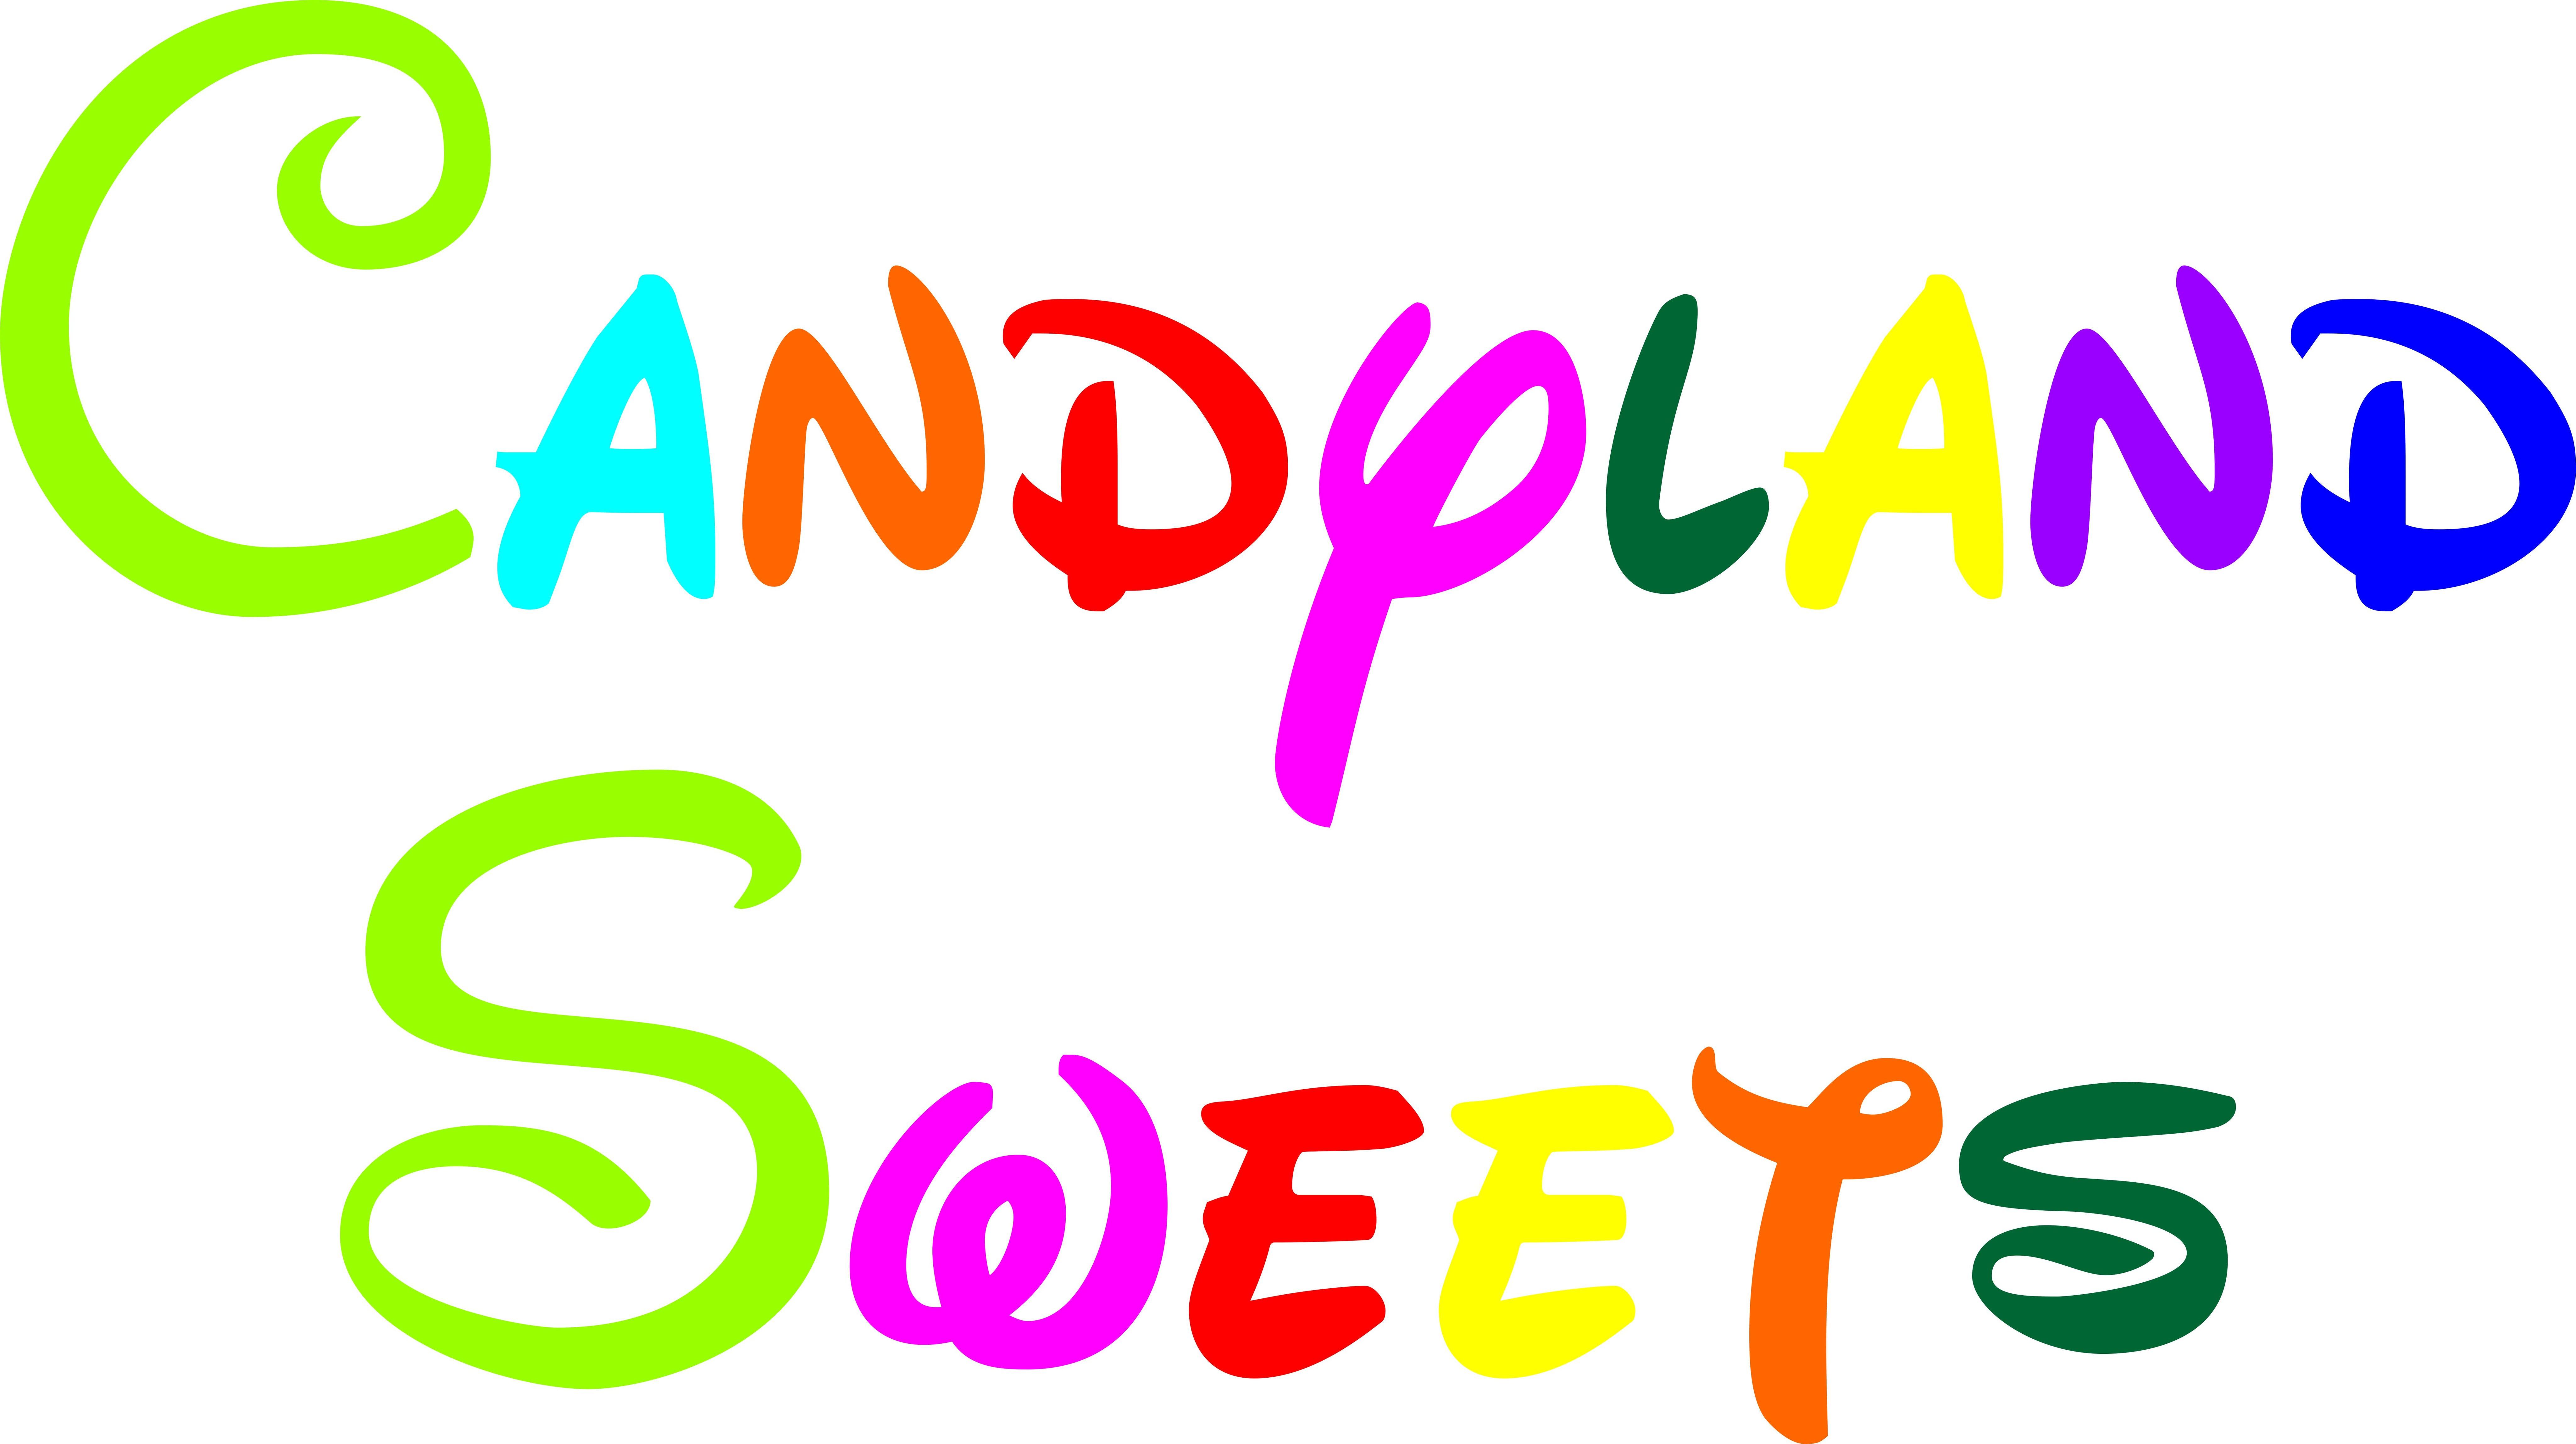 LOGO CANDYLAND SWEETS